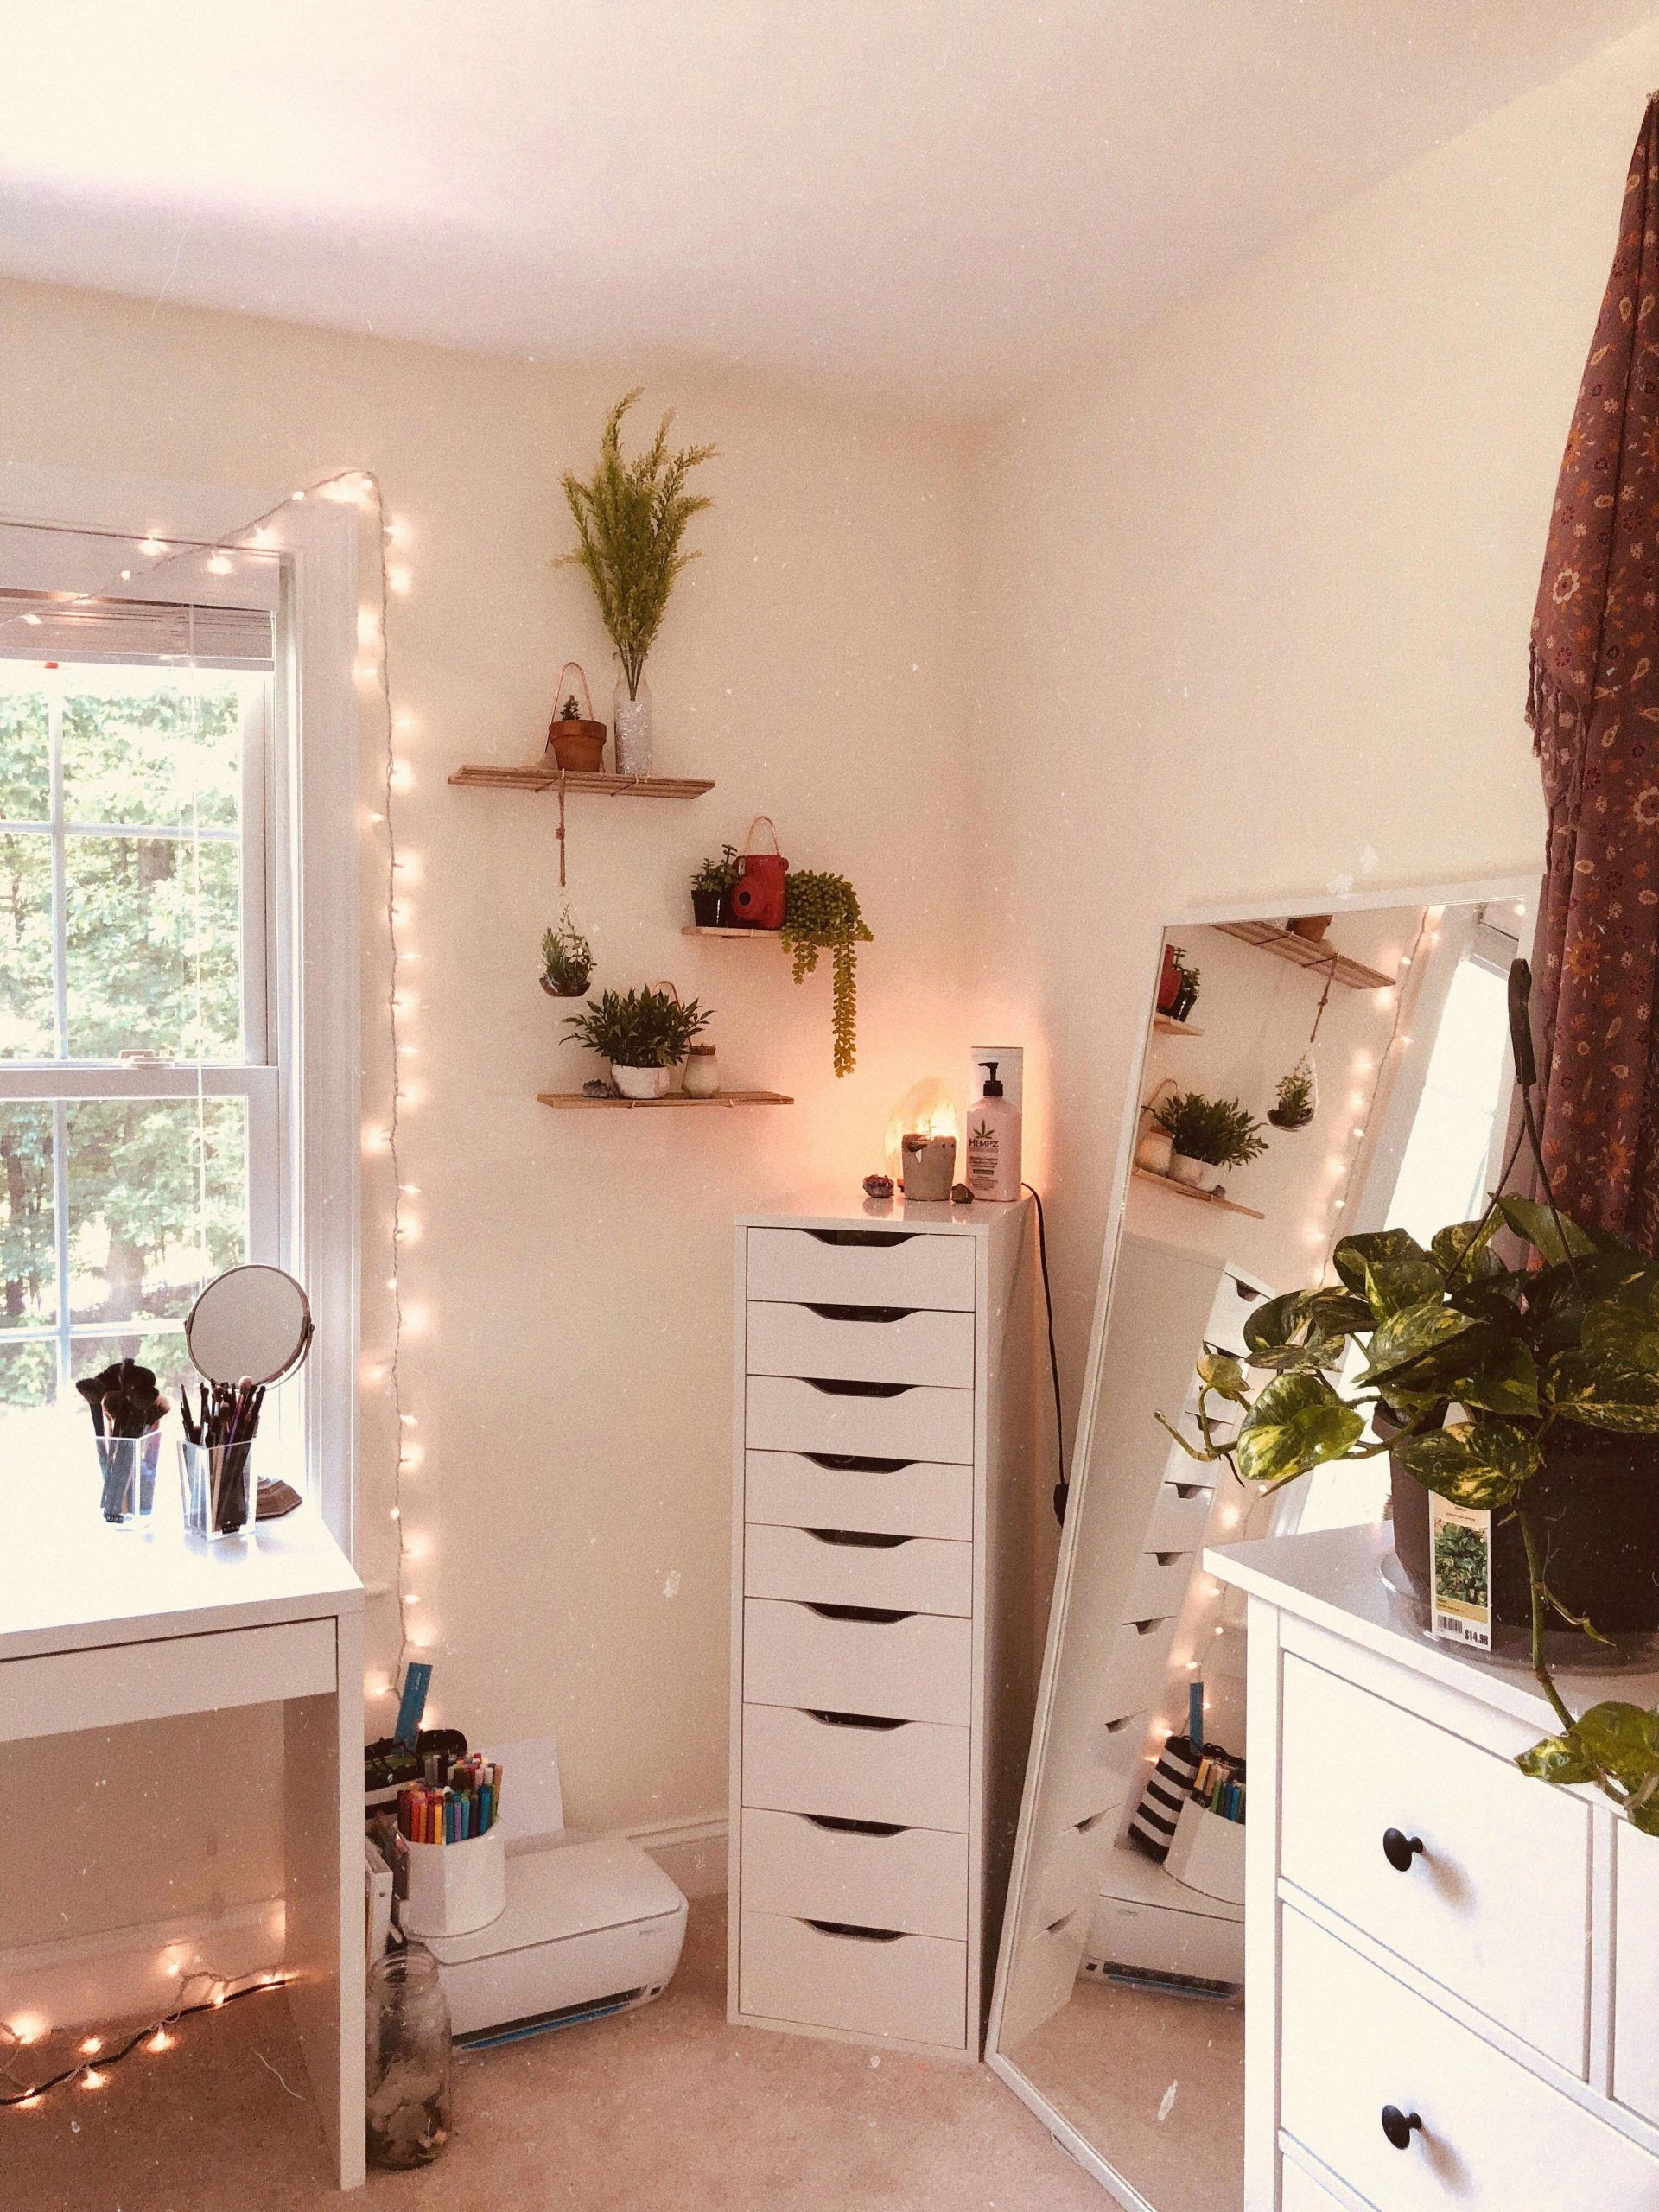 Insta Avemoser White Walls Fairy Lights Green Plants Tapestry Bedroom Decor Idea Bedroom Minimalist Apartment Decor College Apartment Decor Room Inspiration